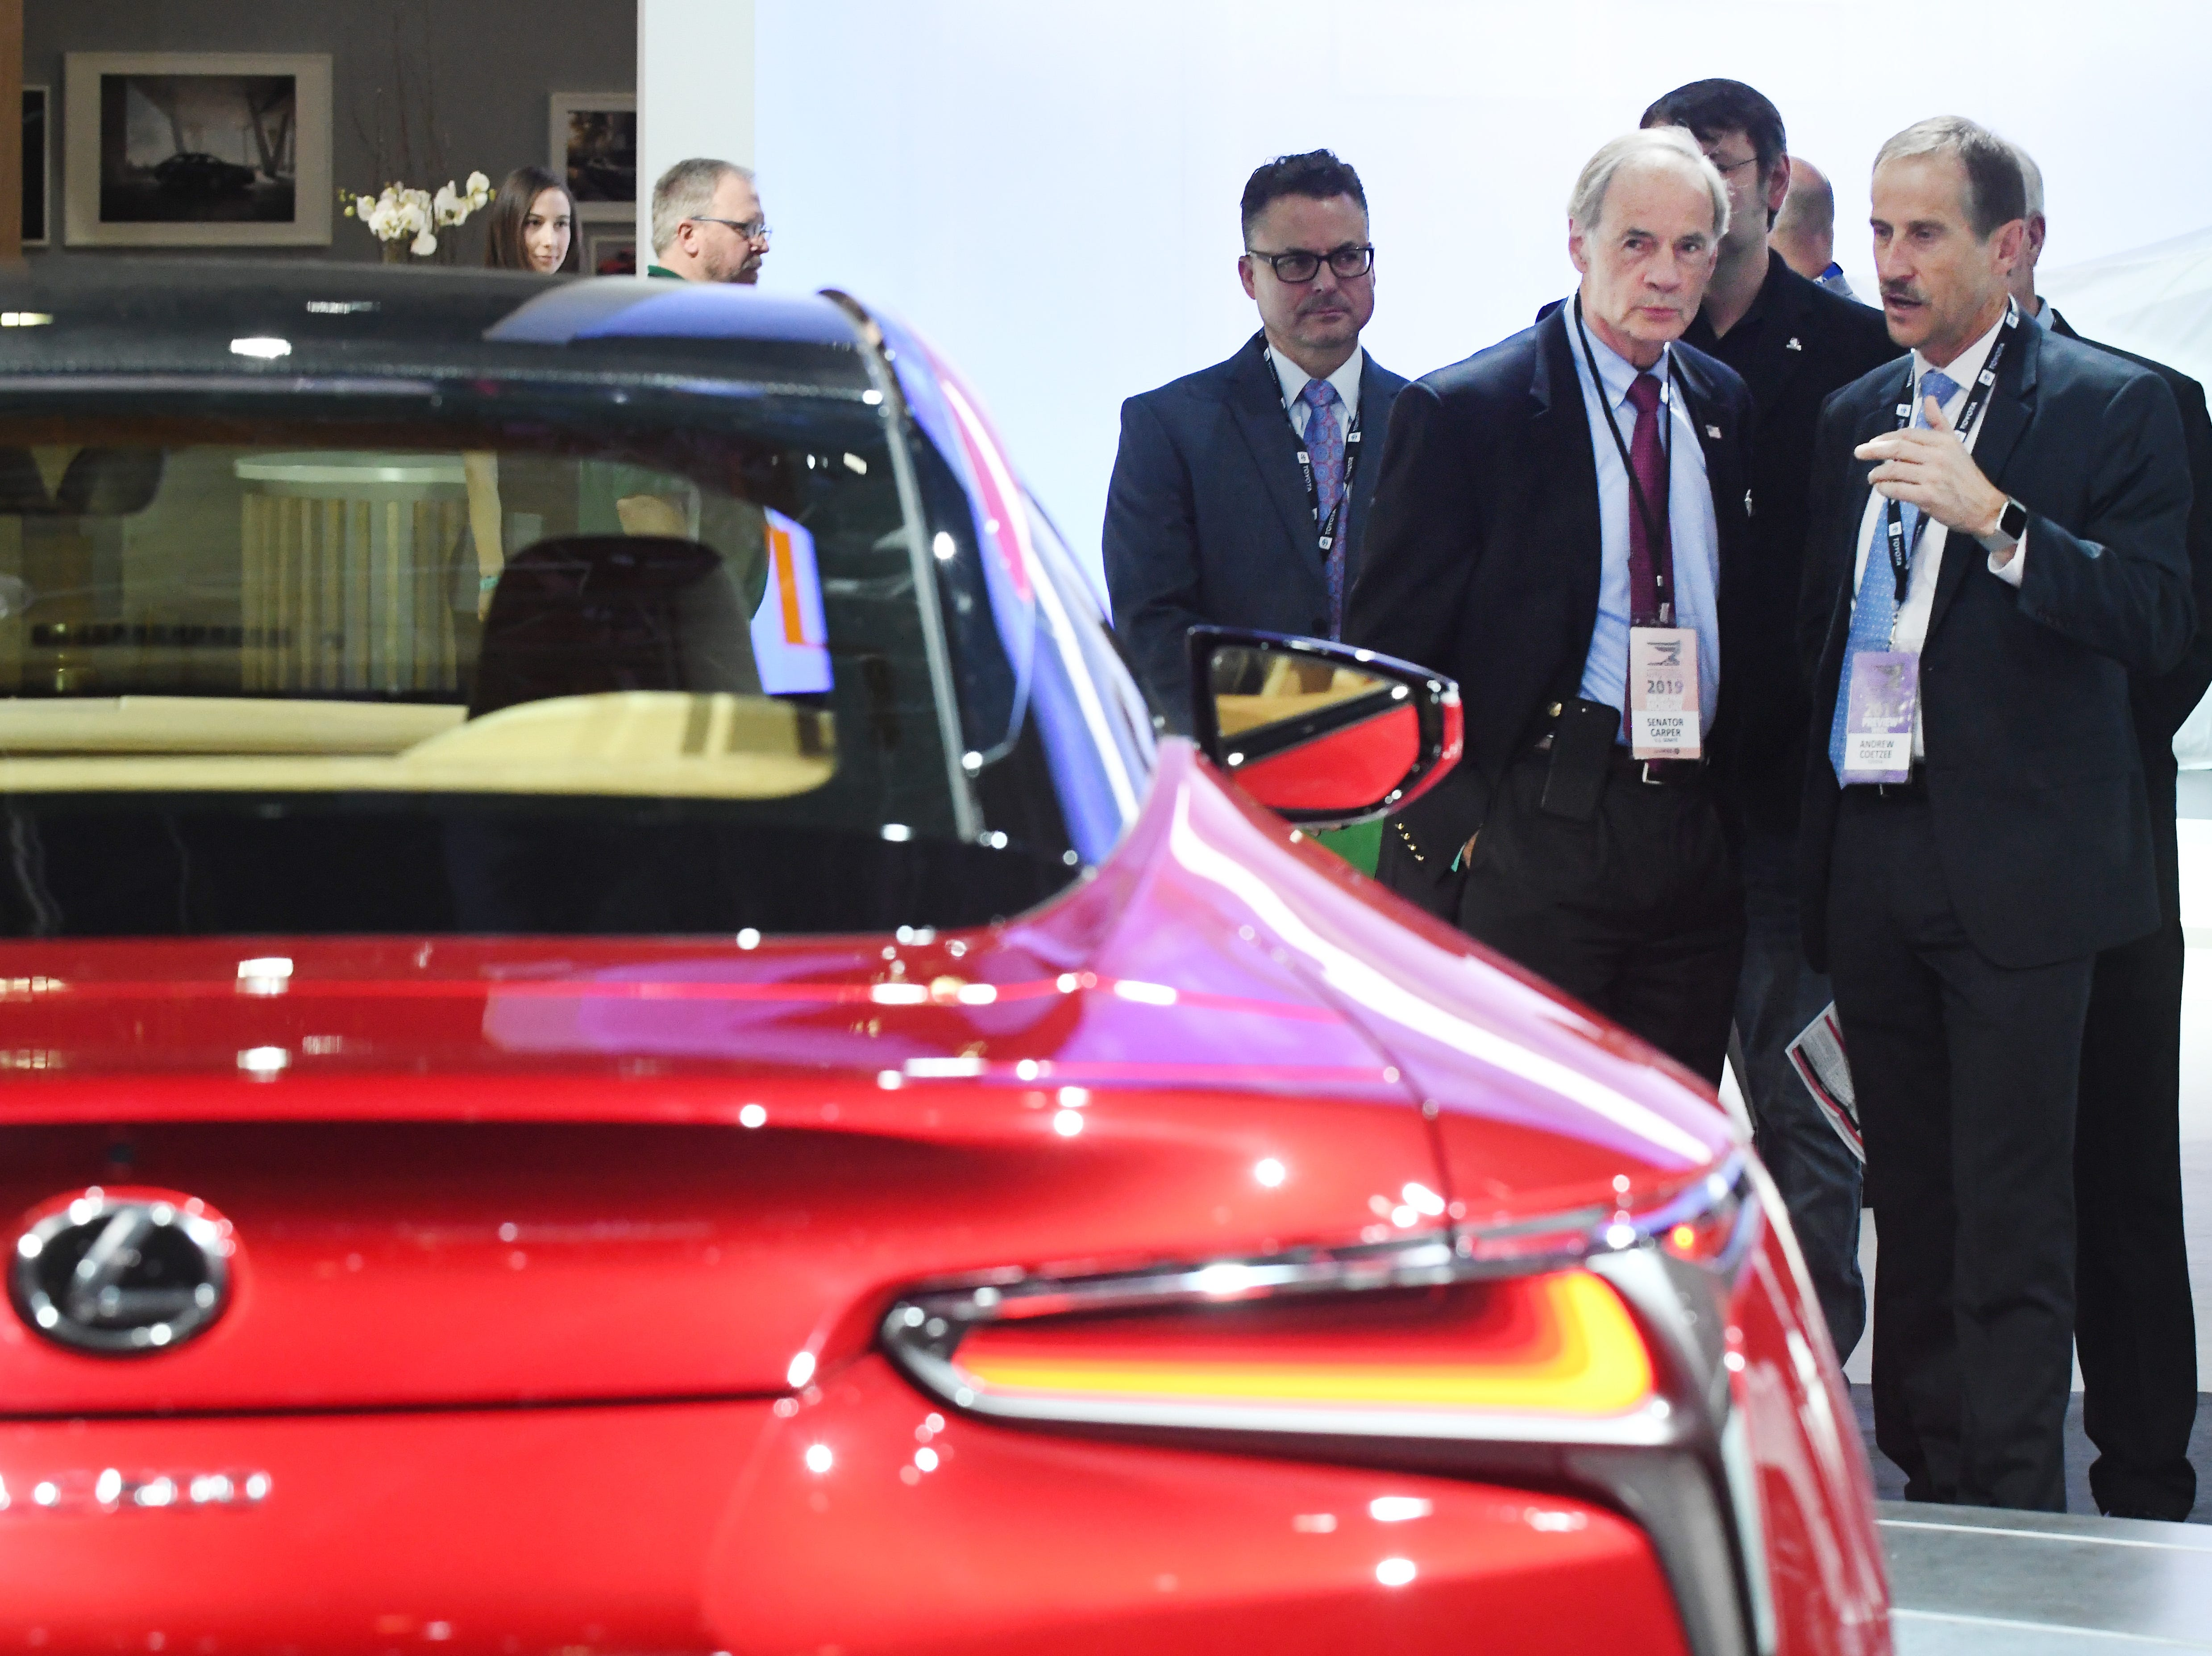 U.S. Sen. Tom Carper of Delaware gets a tour of the Lexus display from Andrew Coetzee of Toyota.